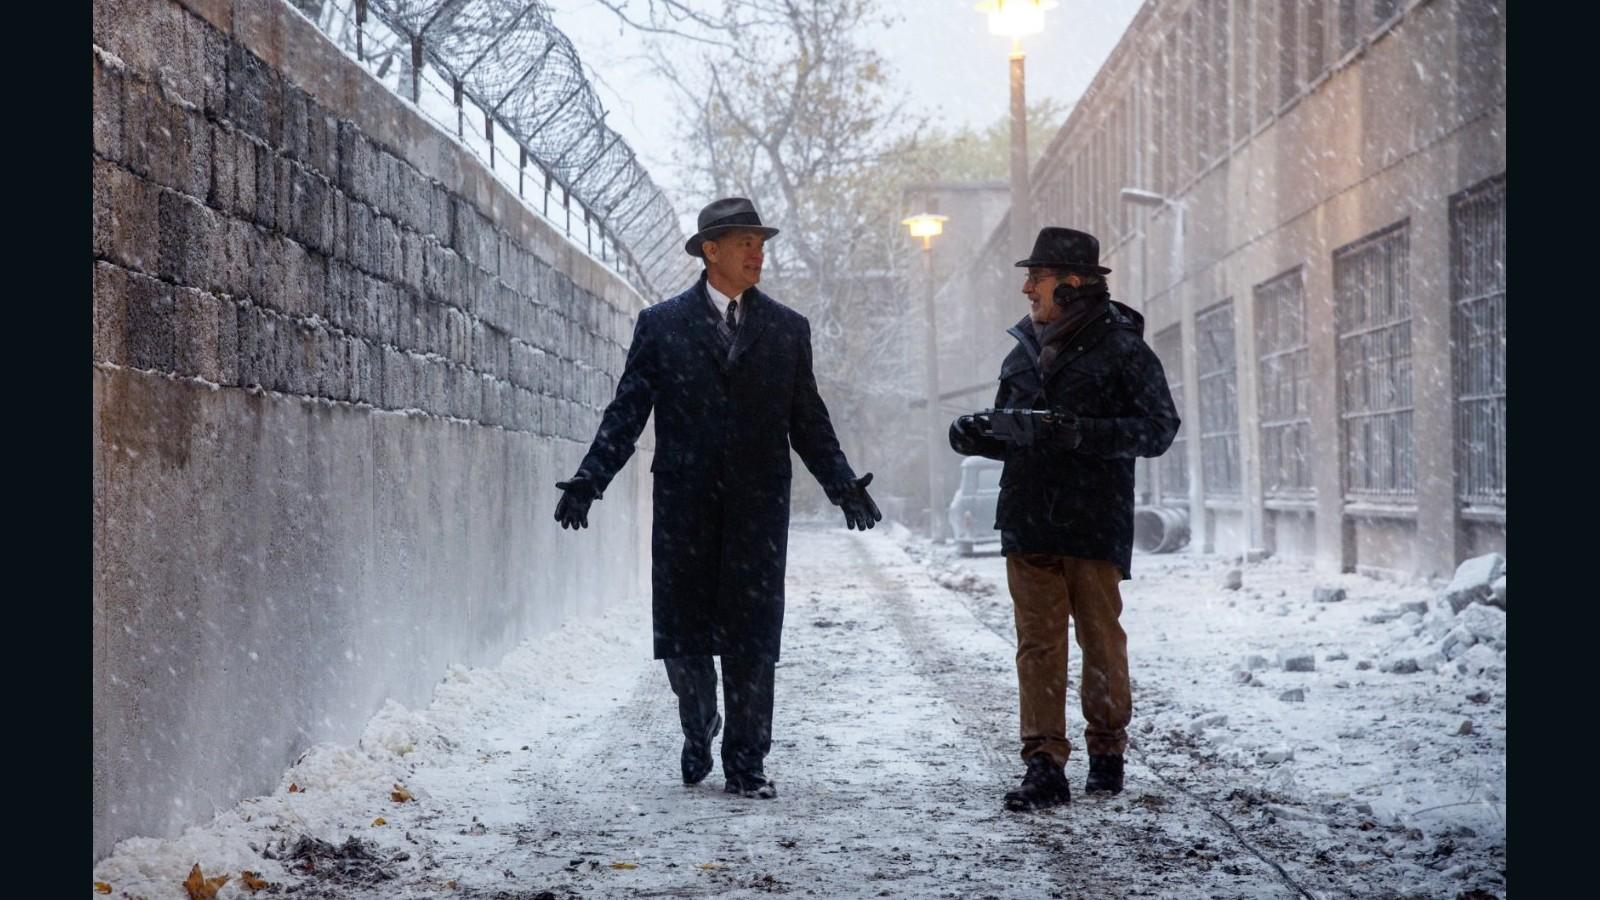 Review: 'Bridge of Spies' an absorbing tale - CNN